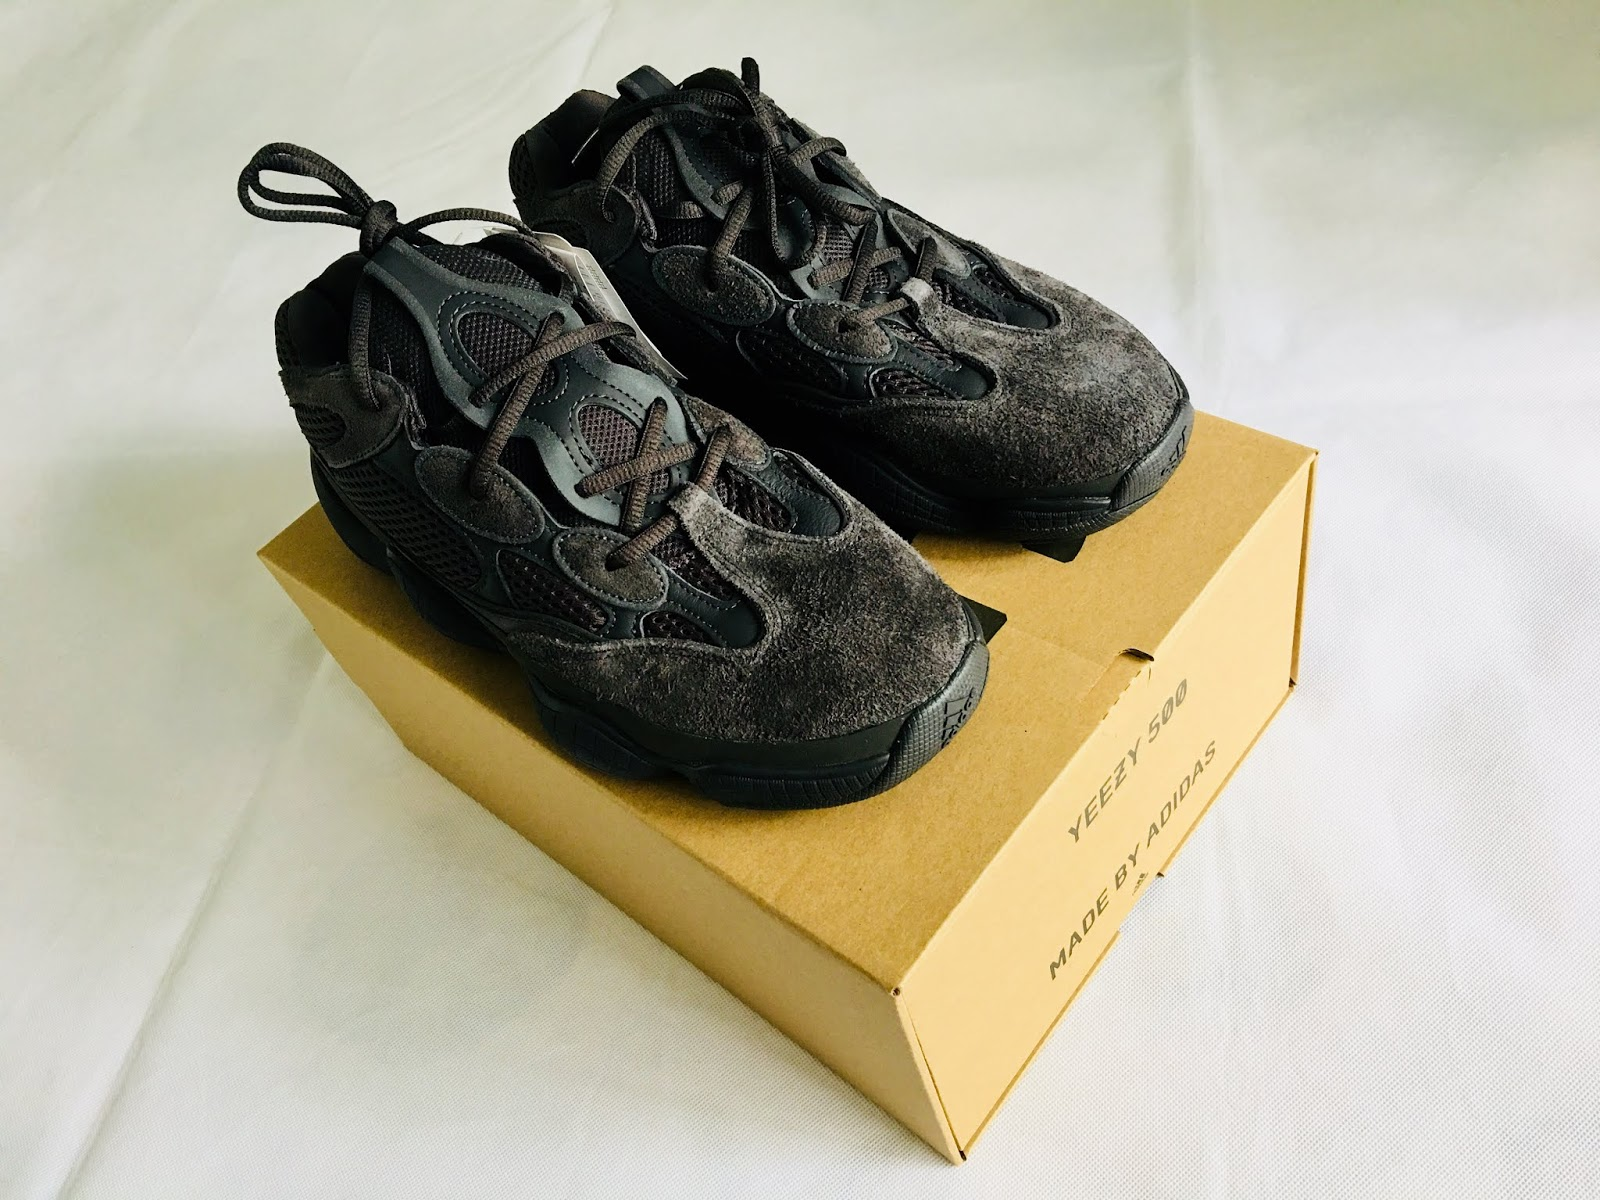 best website d9d2d bc137 Adidas Yeezy 500 Utility Black Sneakers